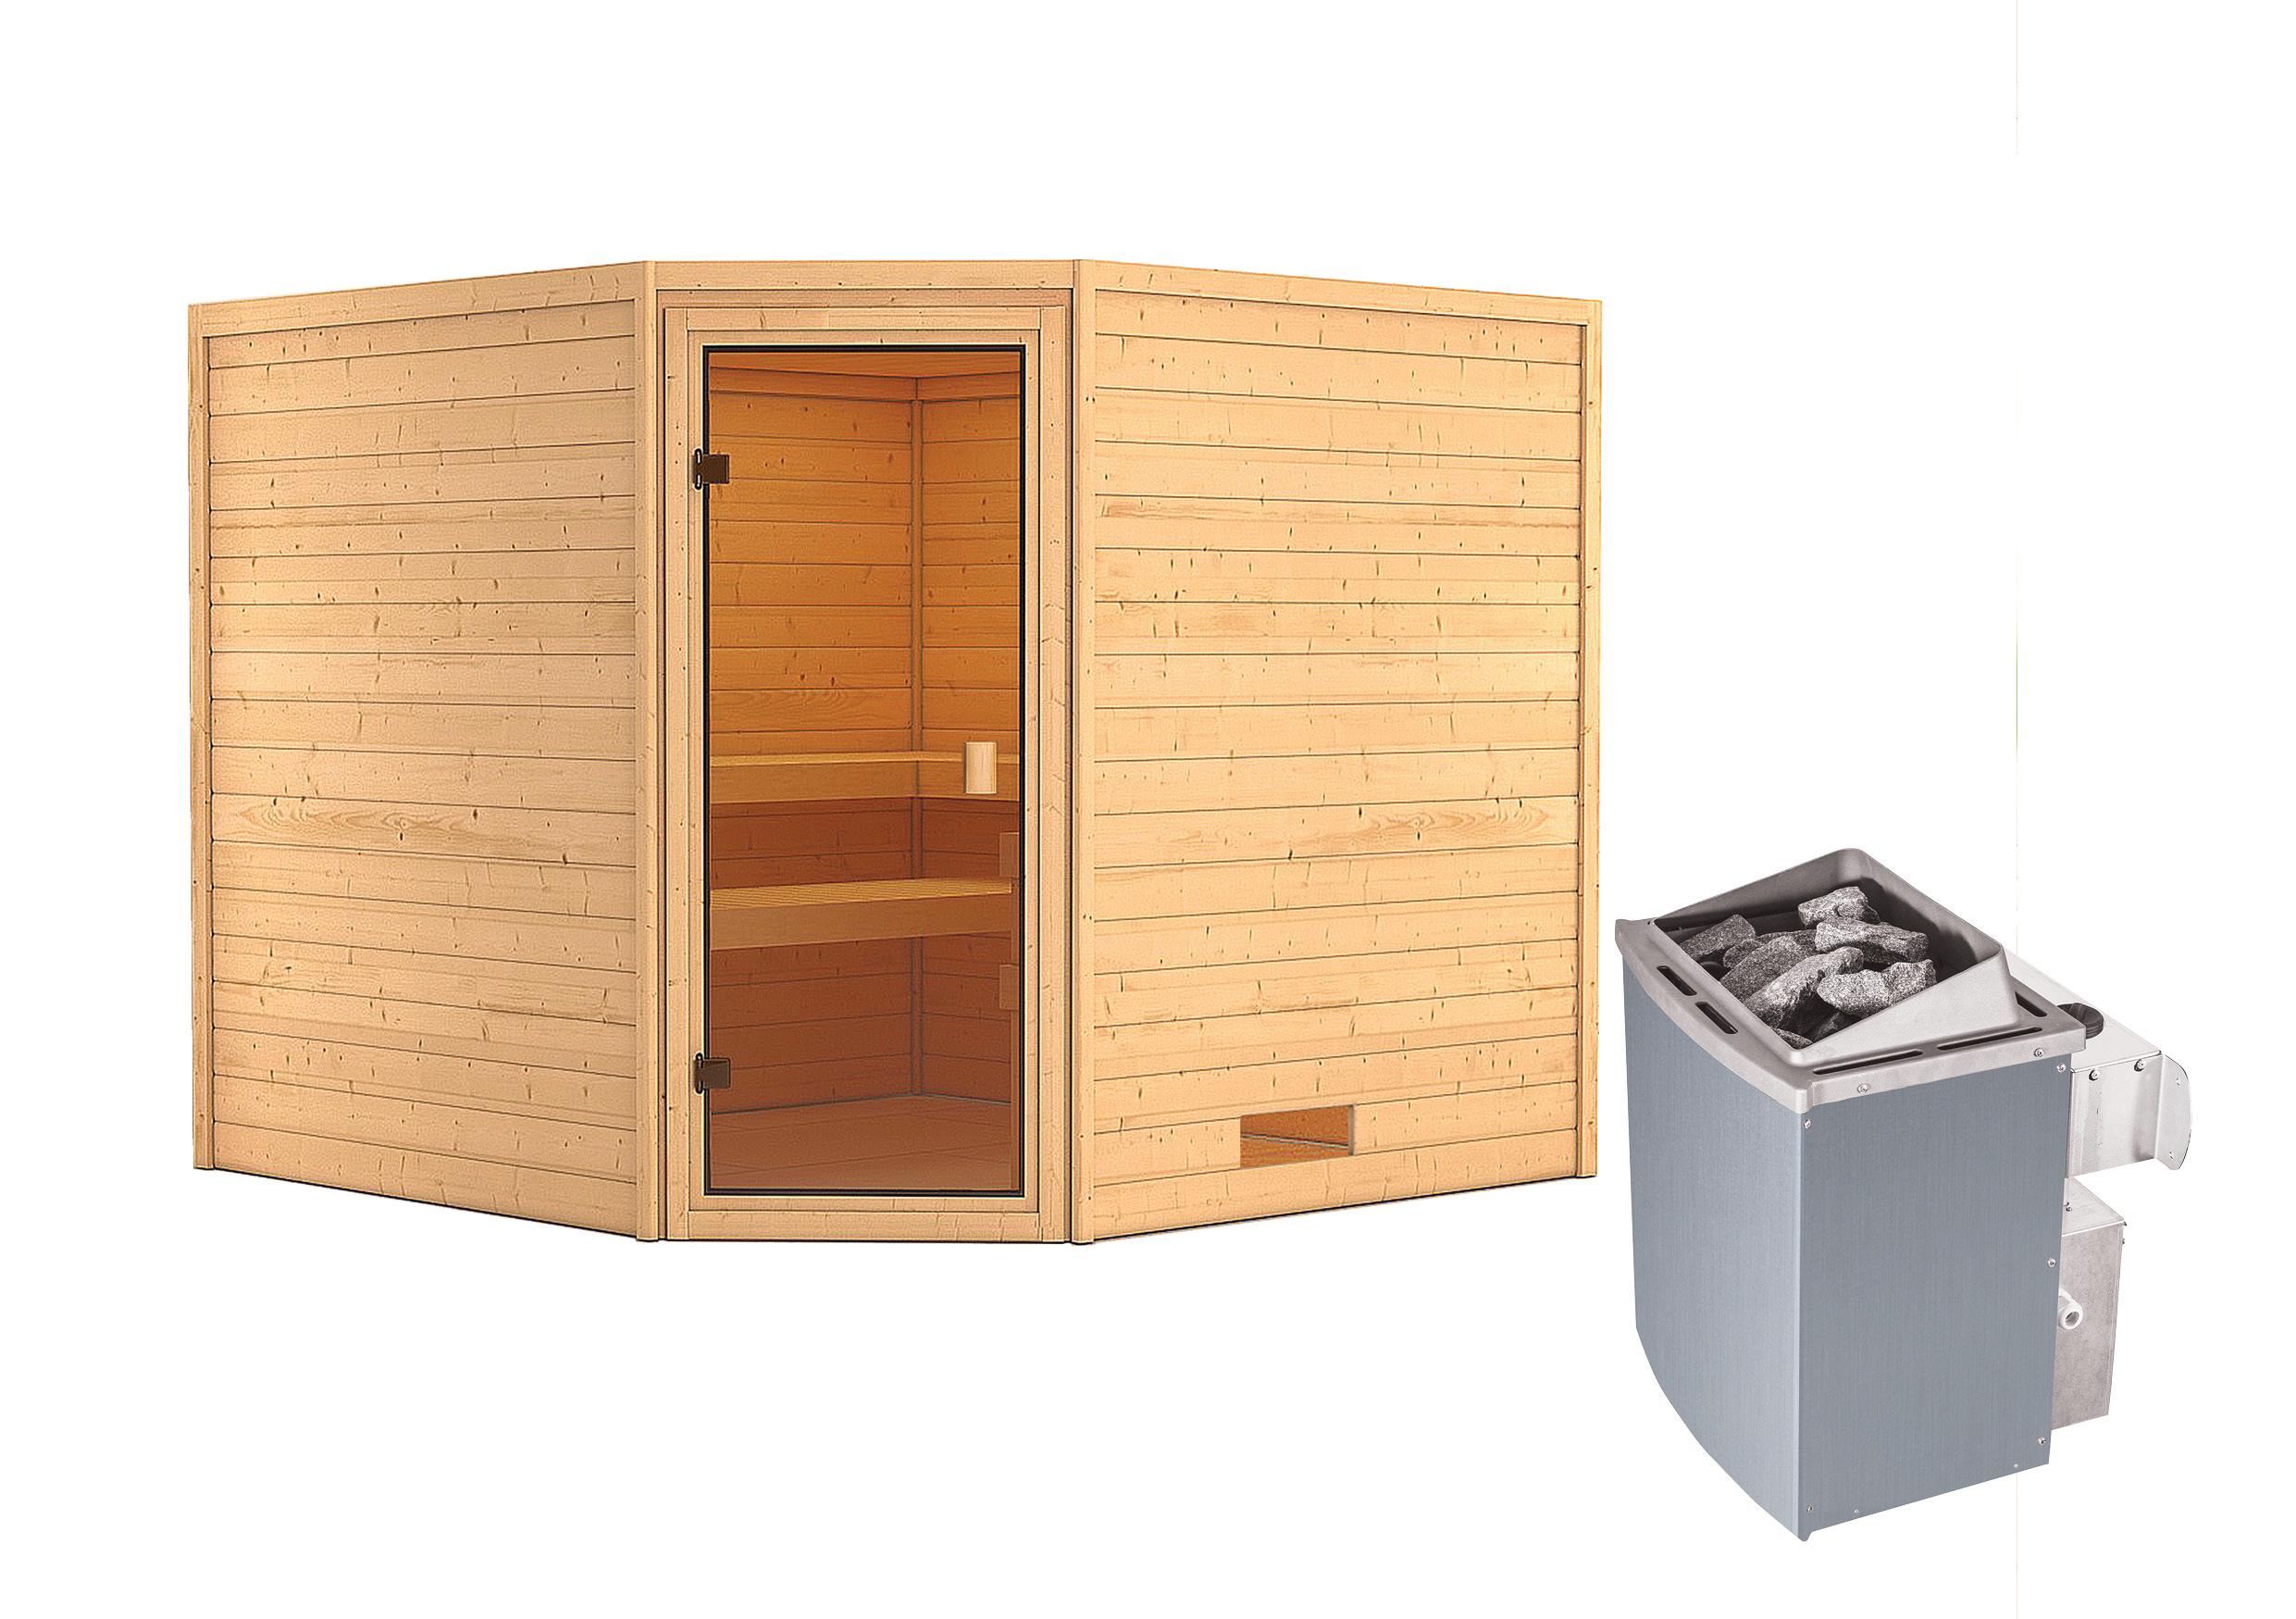 Woodfeeling Sauna Dalia 38mm Saunaofen 9 kW intern Bild 9